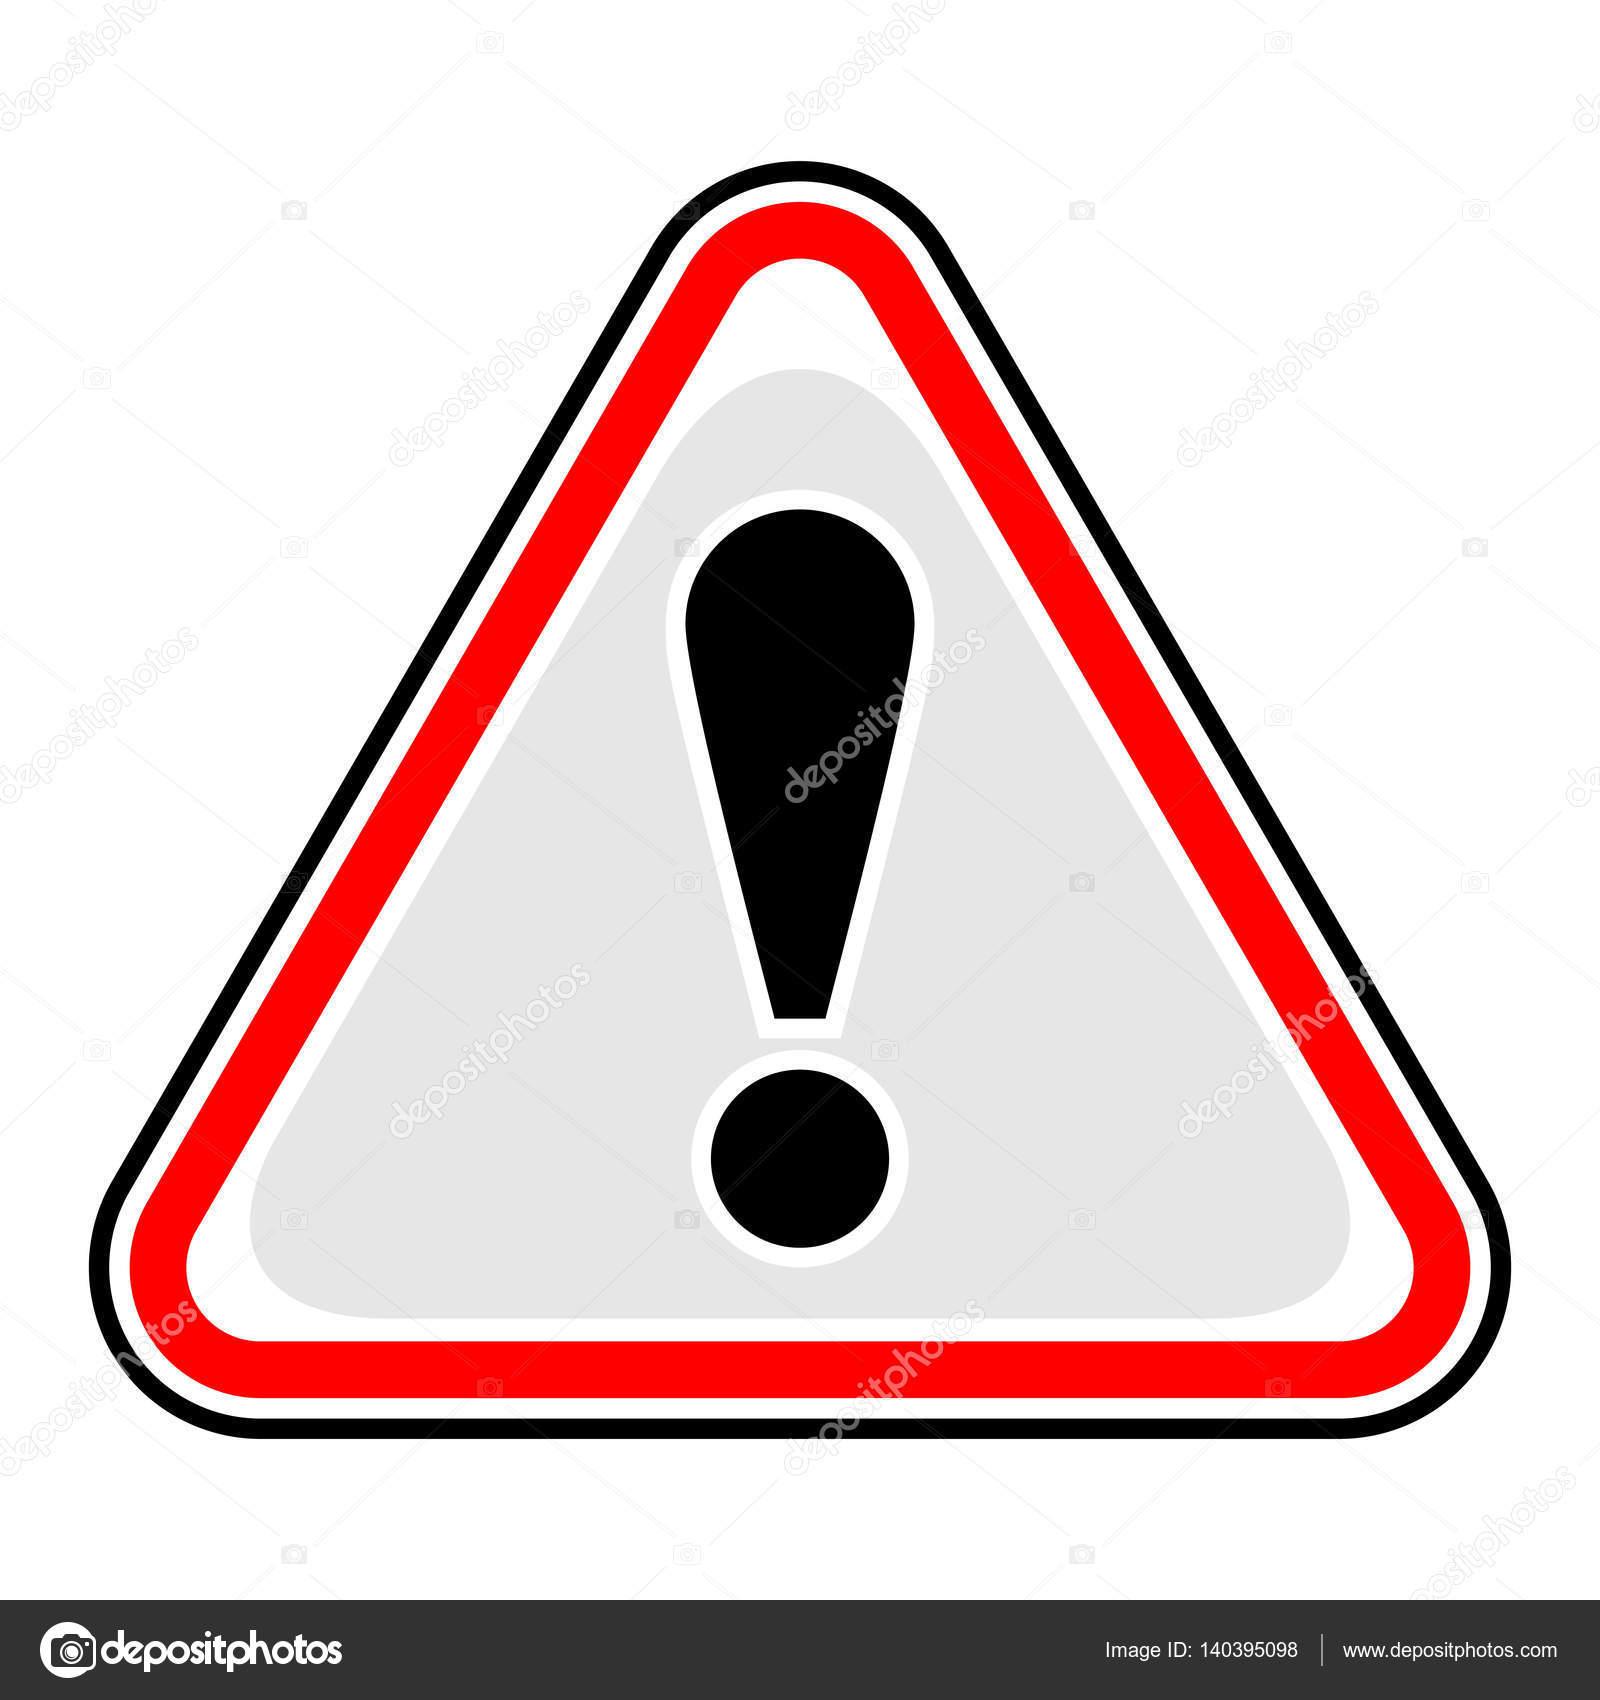 d exclamation point avertissement attention danger signe image vectorielle ifeelgood 140395098. Black Bedroom Furniture Sets. Home Design Ideas